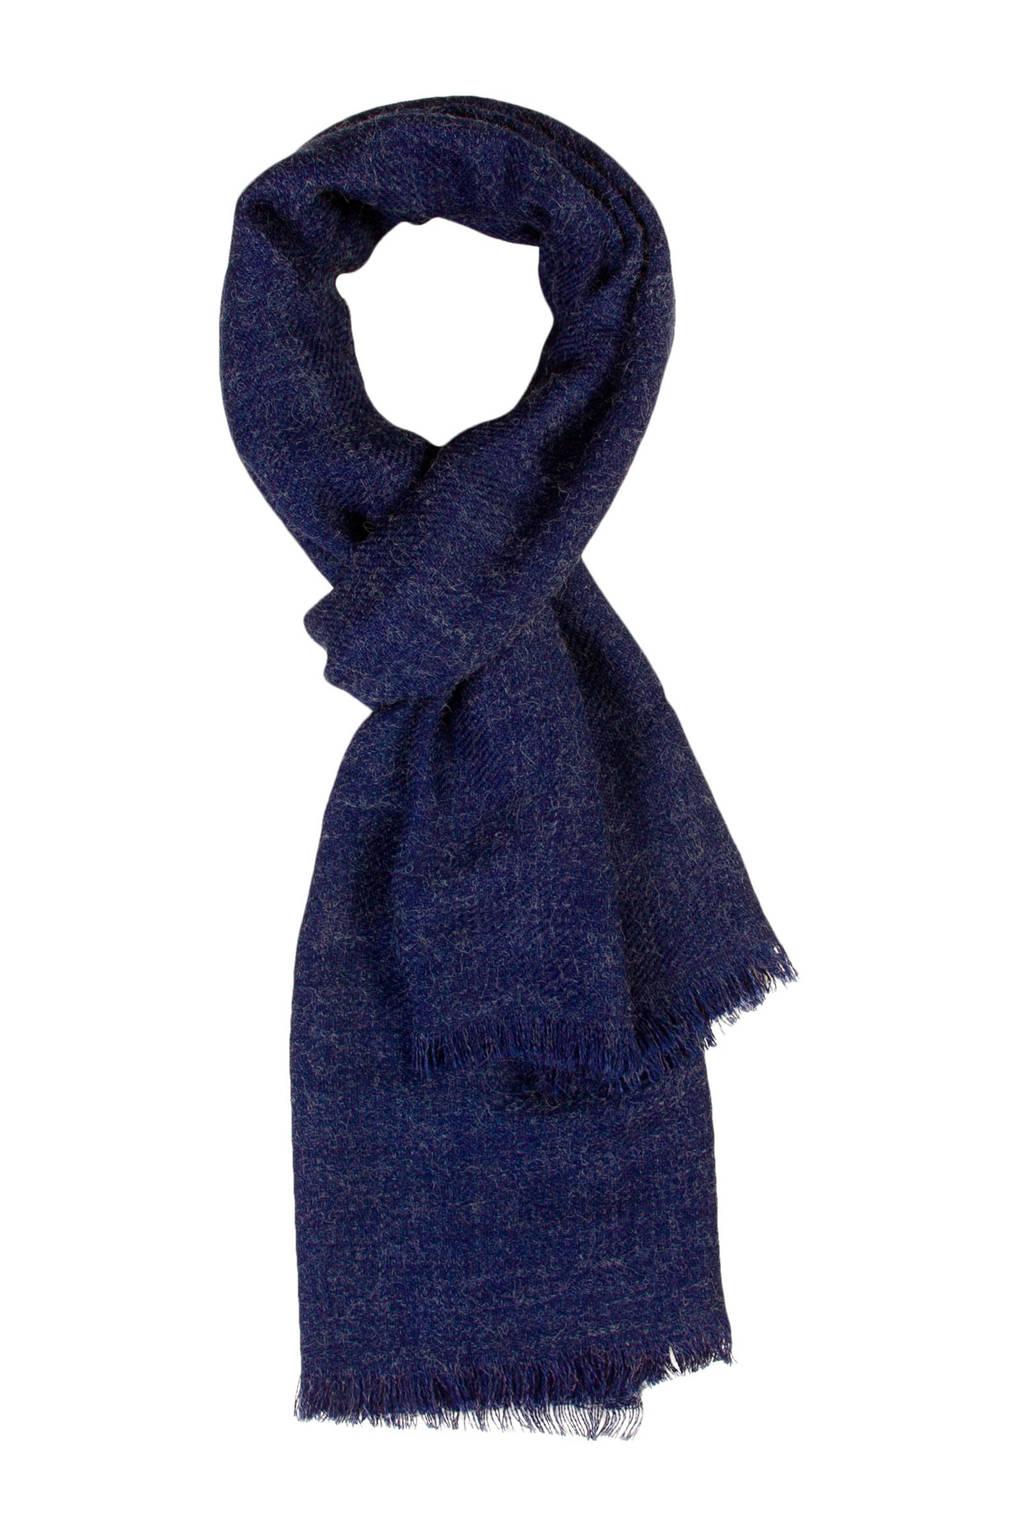 Miss Etam Accessoires sjaal blauw, Blauw